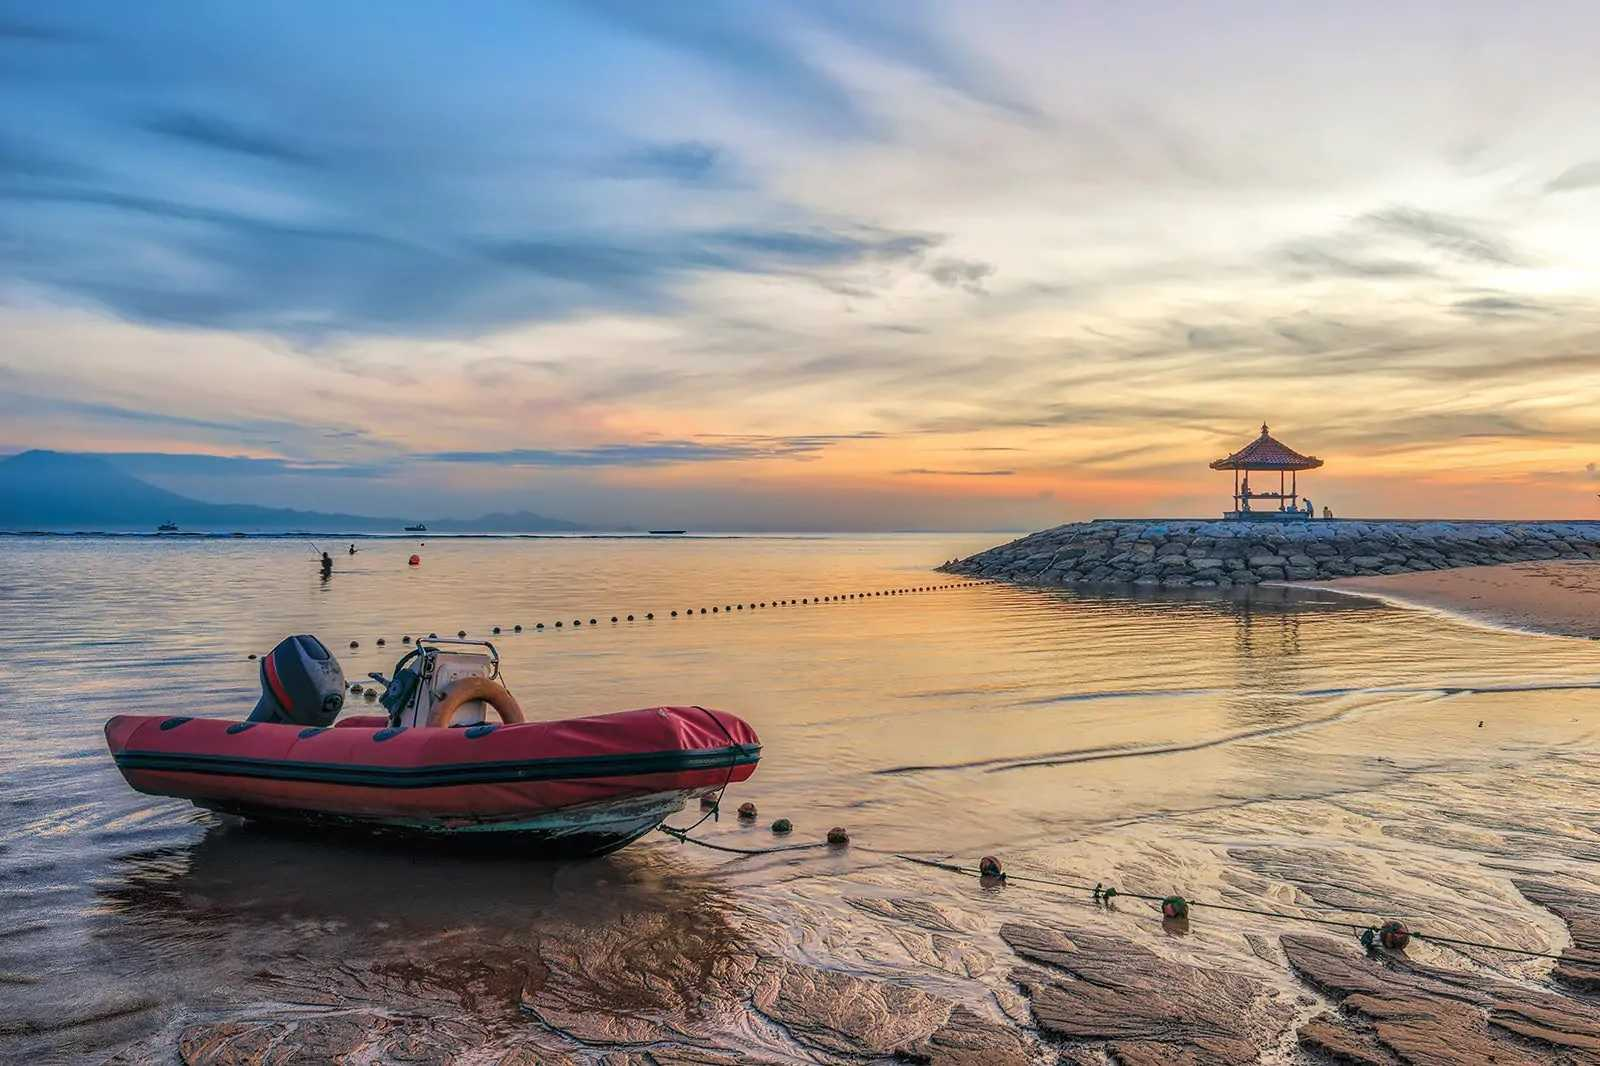 Harga Tiket Tanjung Benoa